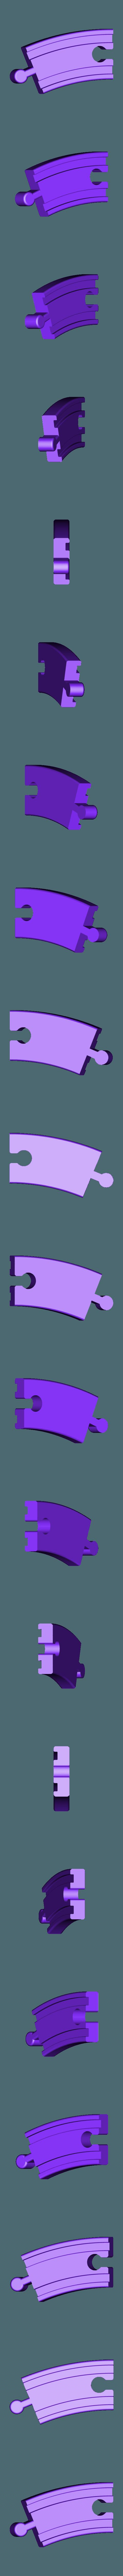 Short Left Turn Track.stl Download free STL file Toy Train Tracks • 3D printer design, FerryTeacher